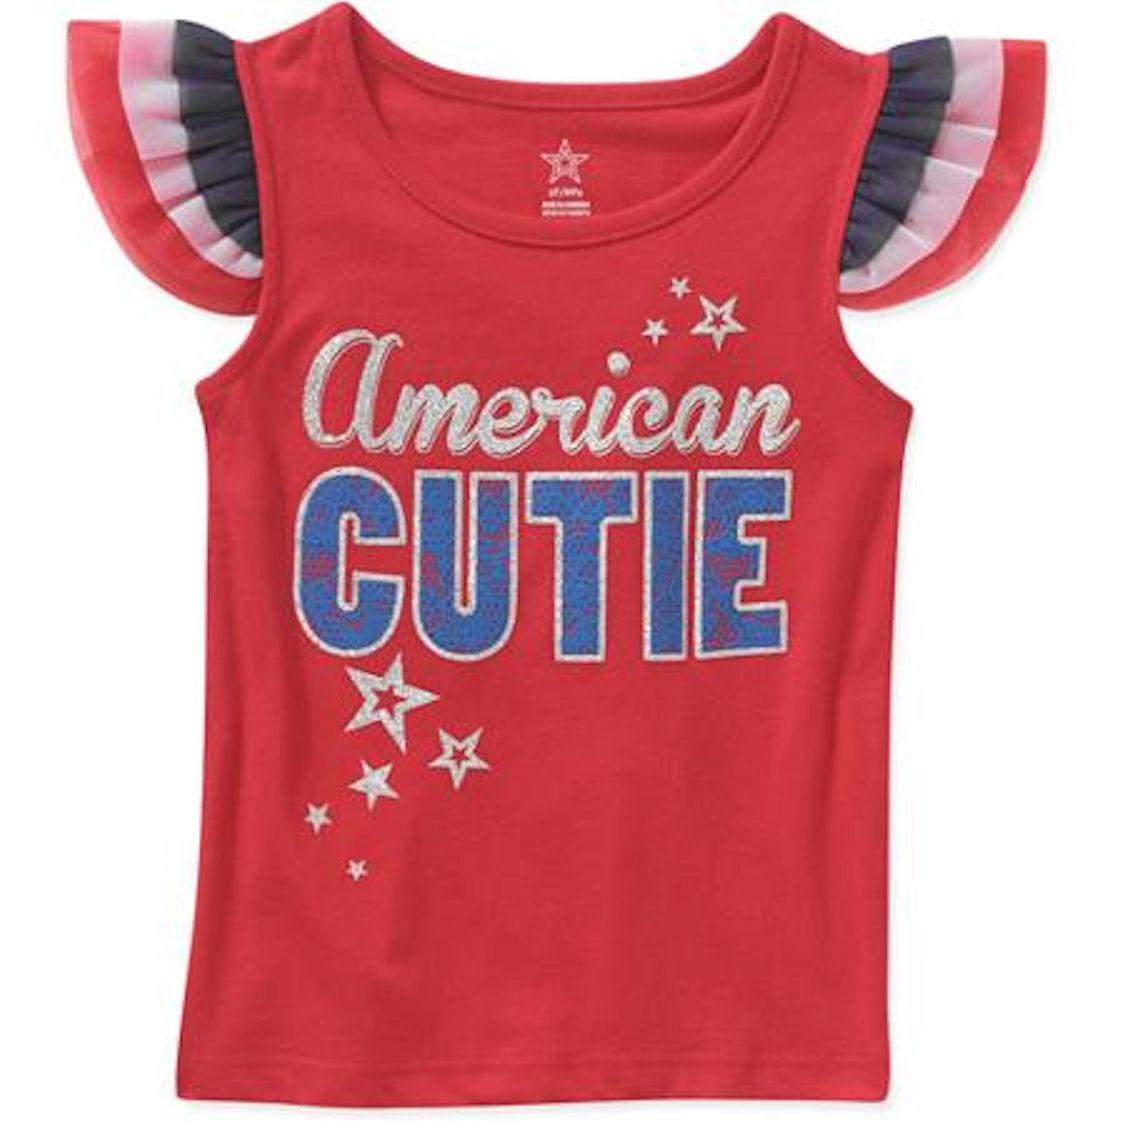 Patriotic American Cutie Infants Toddler Girls Flutter Tank (4T)